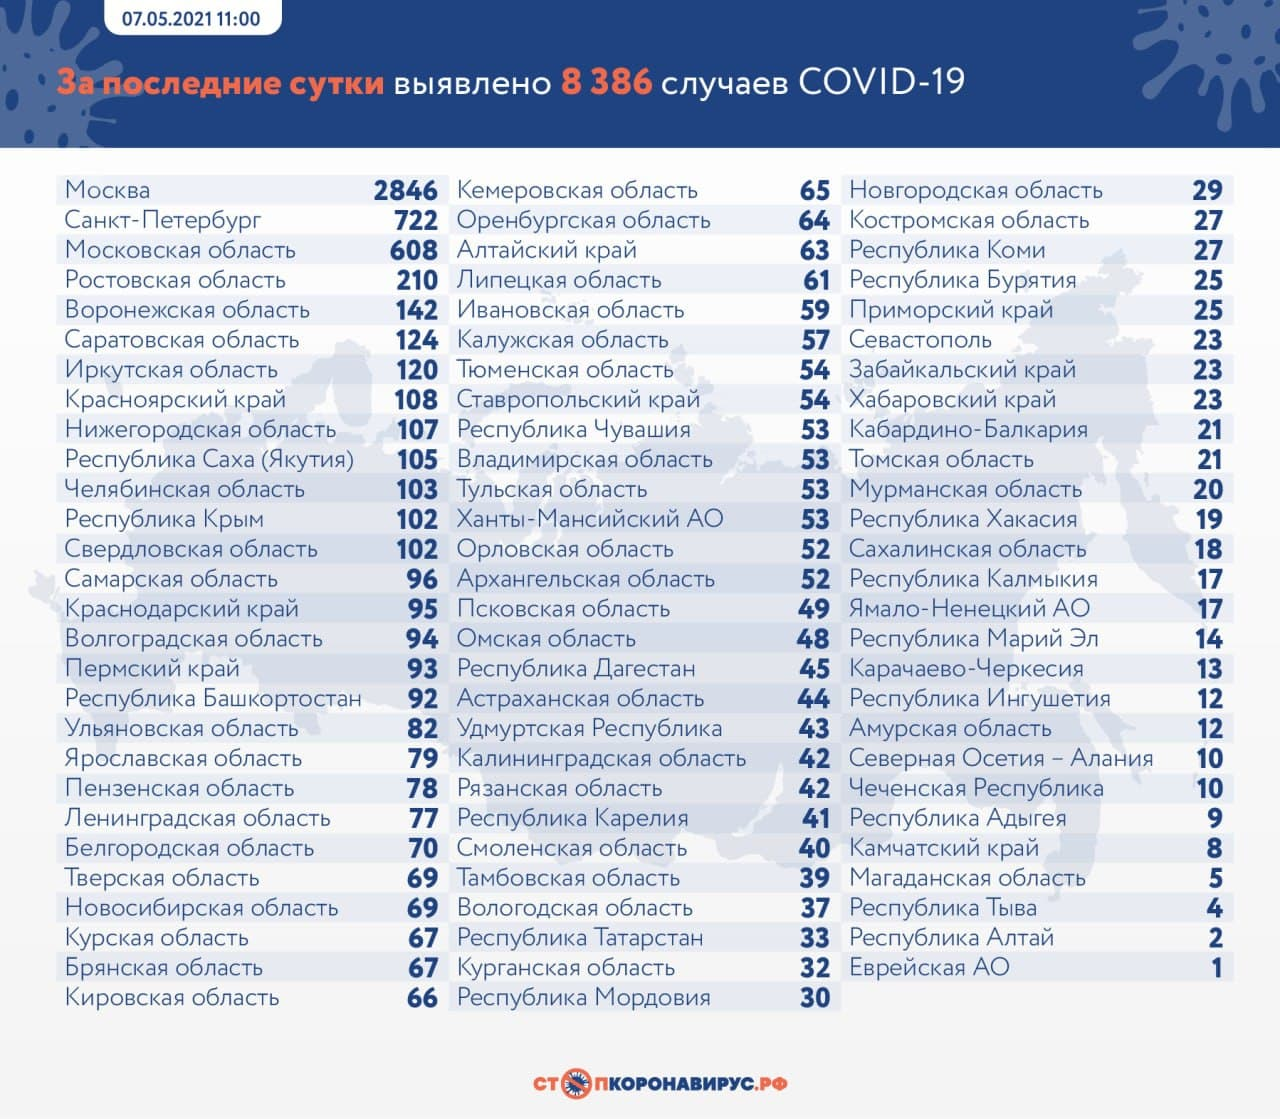 Оперативная статистика по коронавирусу в России на 7 мая